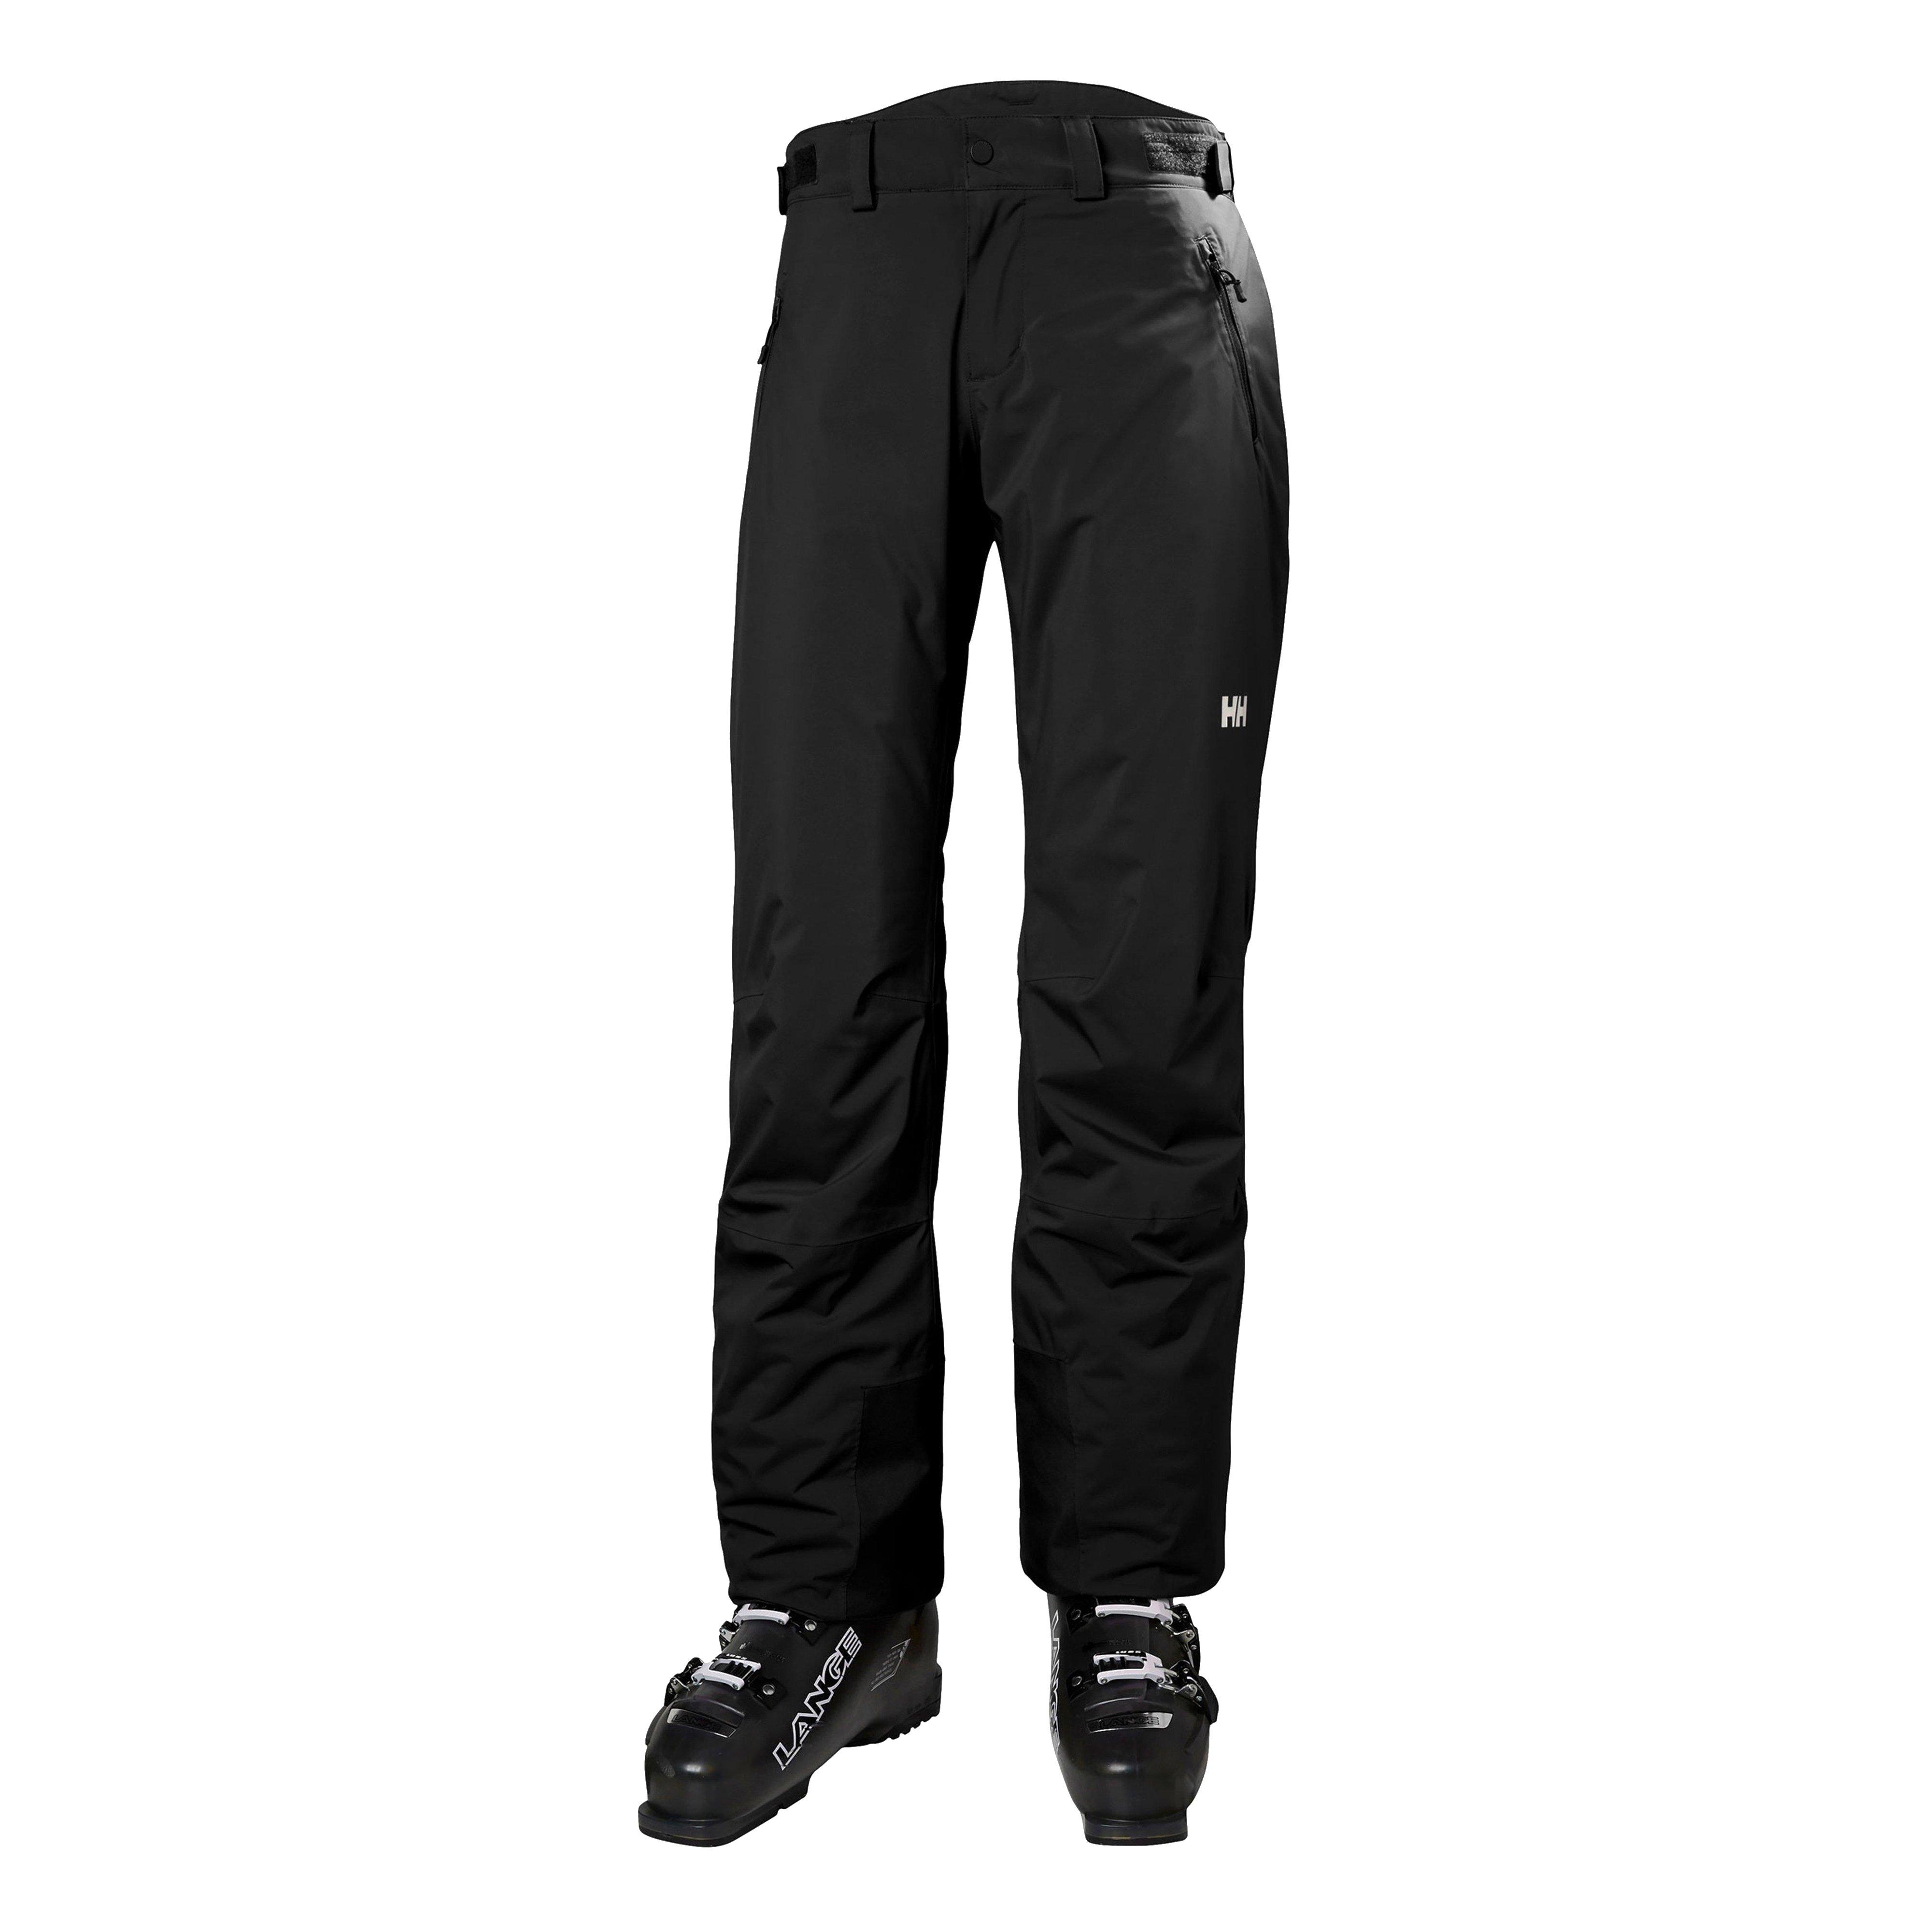 Helly Hansen Women's Snowstar Ski Pant - Black, Black